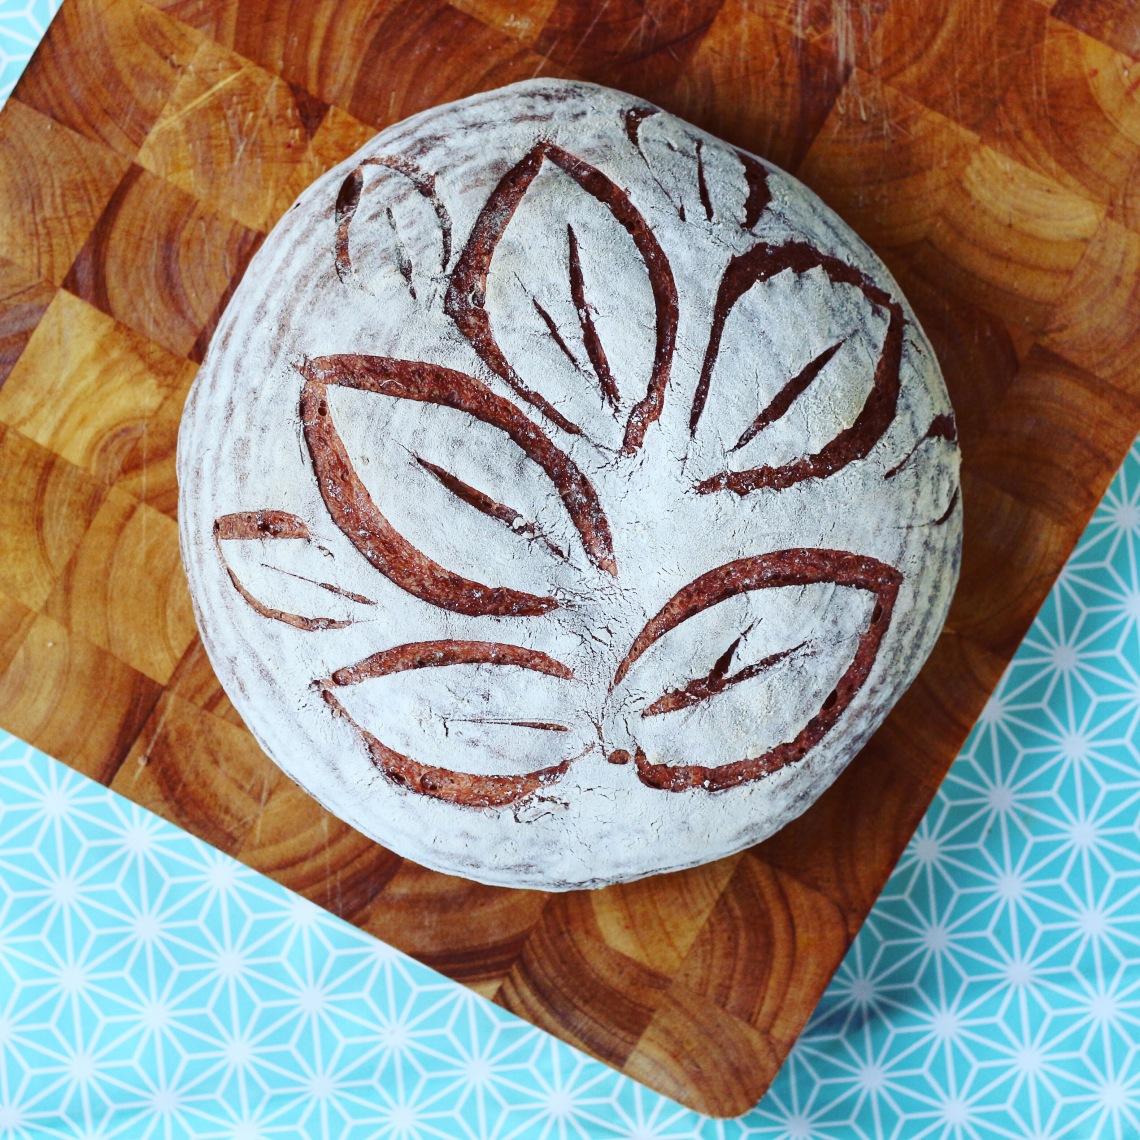 scored loaf - copyright image Lynn Clark - inksugarspice